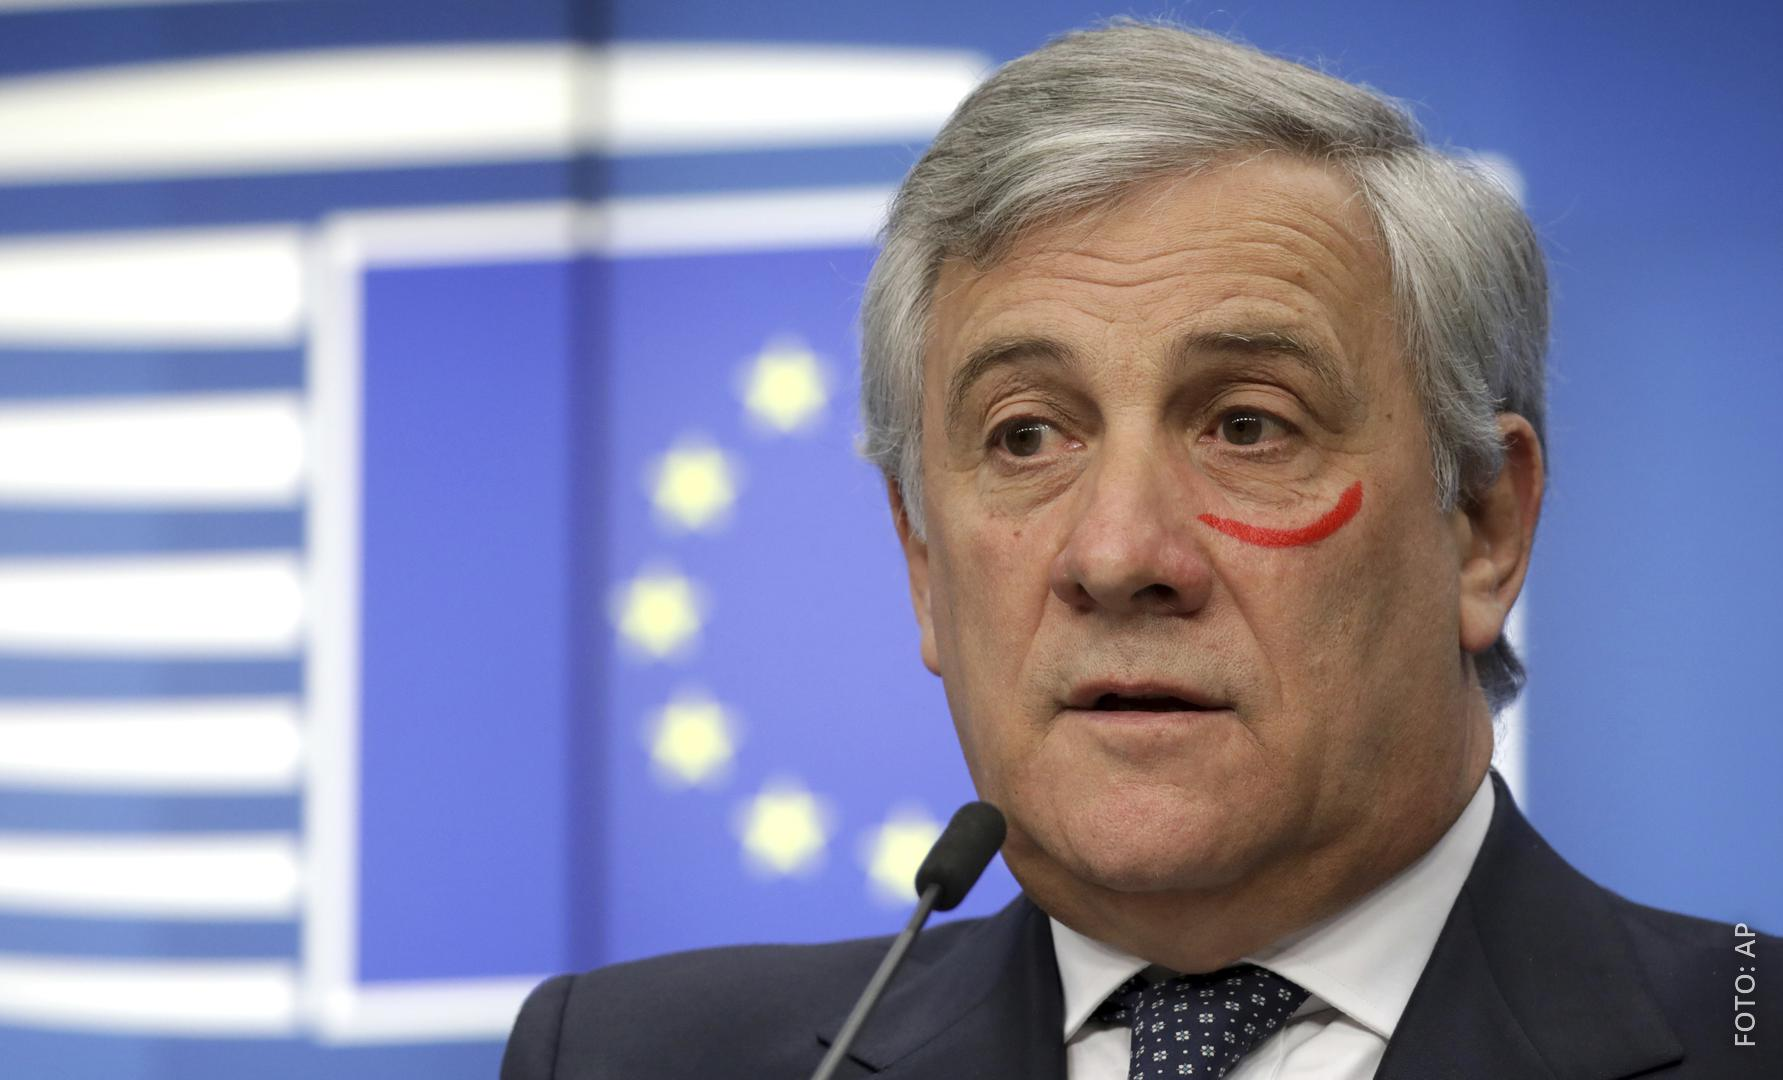 EU-Parlamentspräsident Tajani hat einen roten Kreis unterm Auge